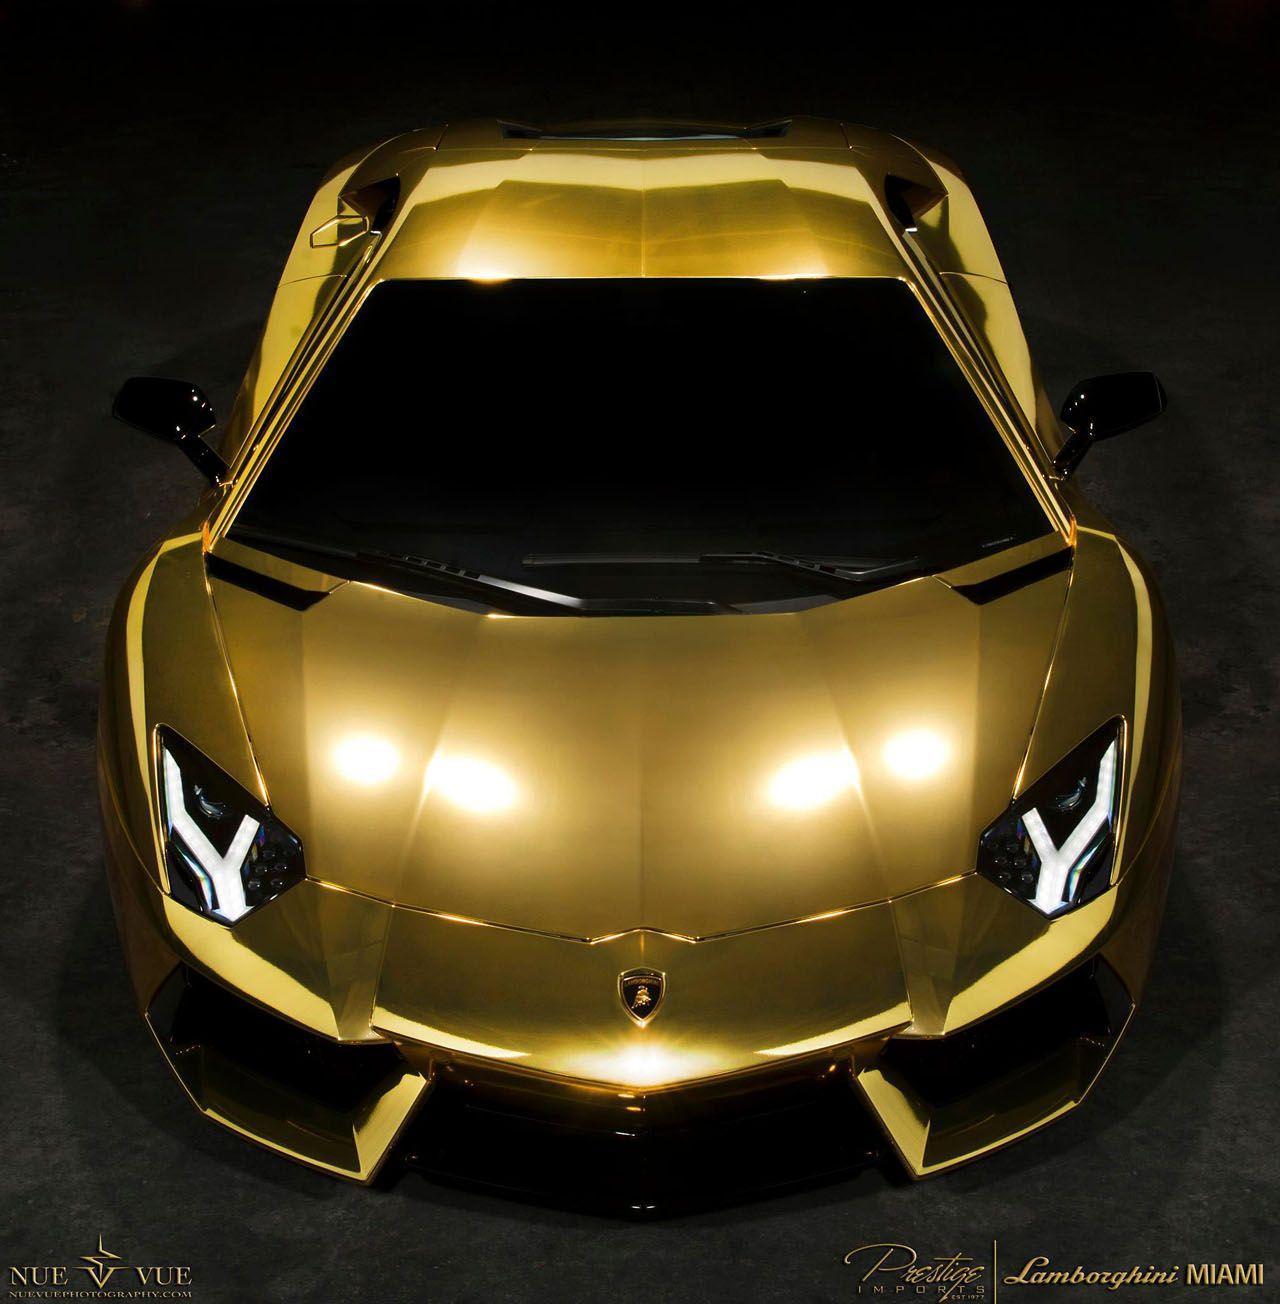 Lamborghini Walpaper: Gold Lamborghini Wallpapers